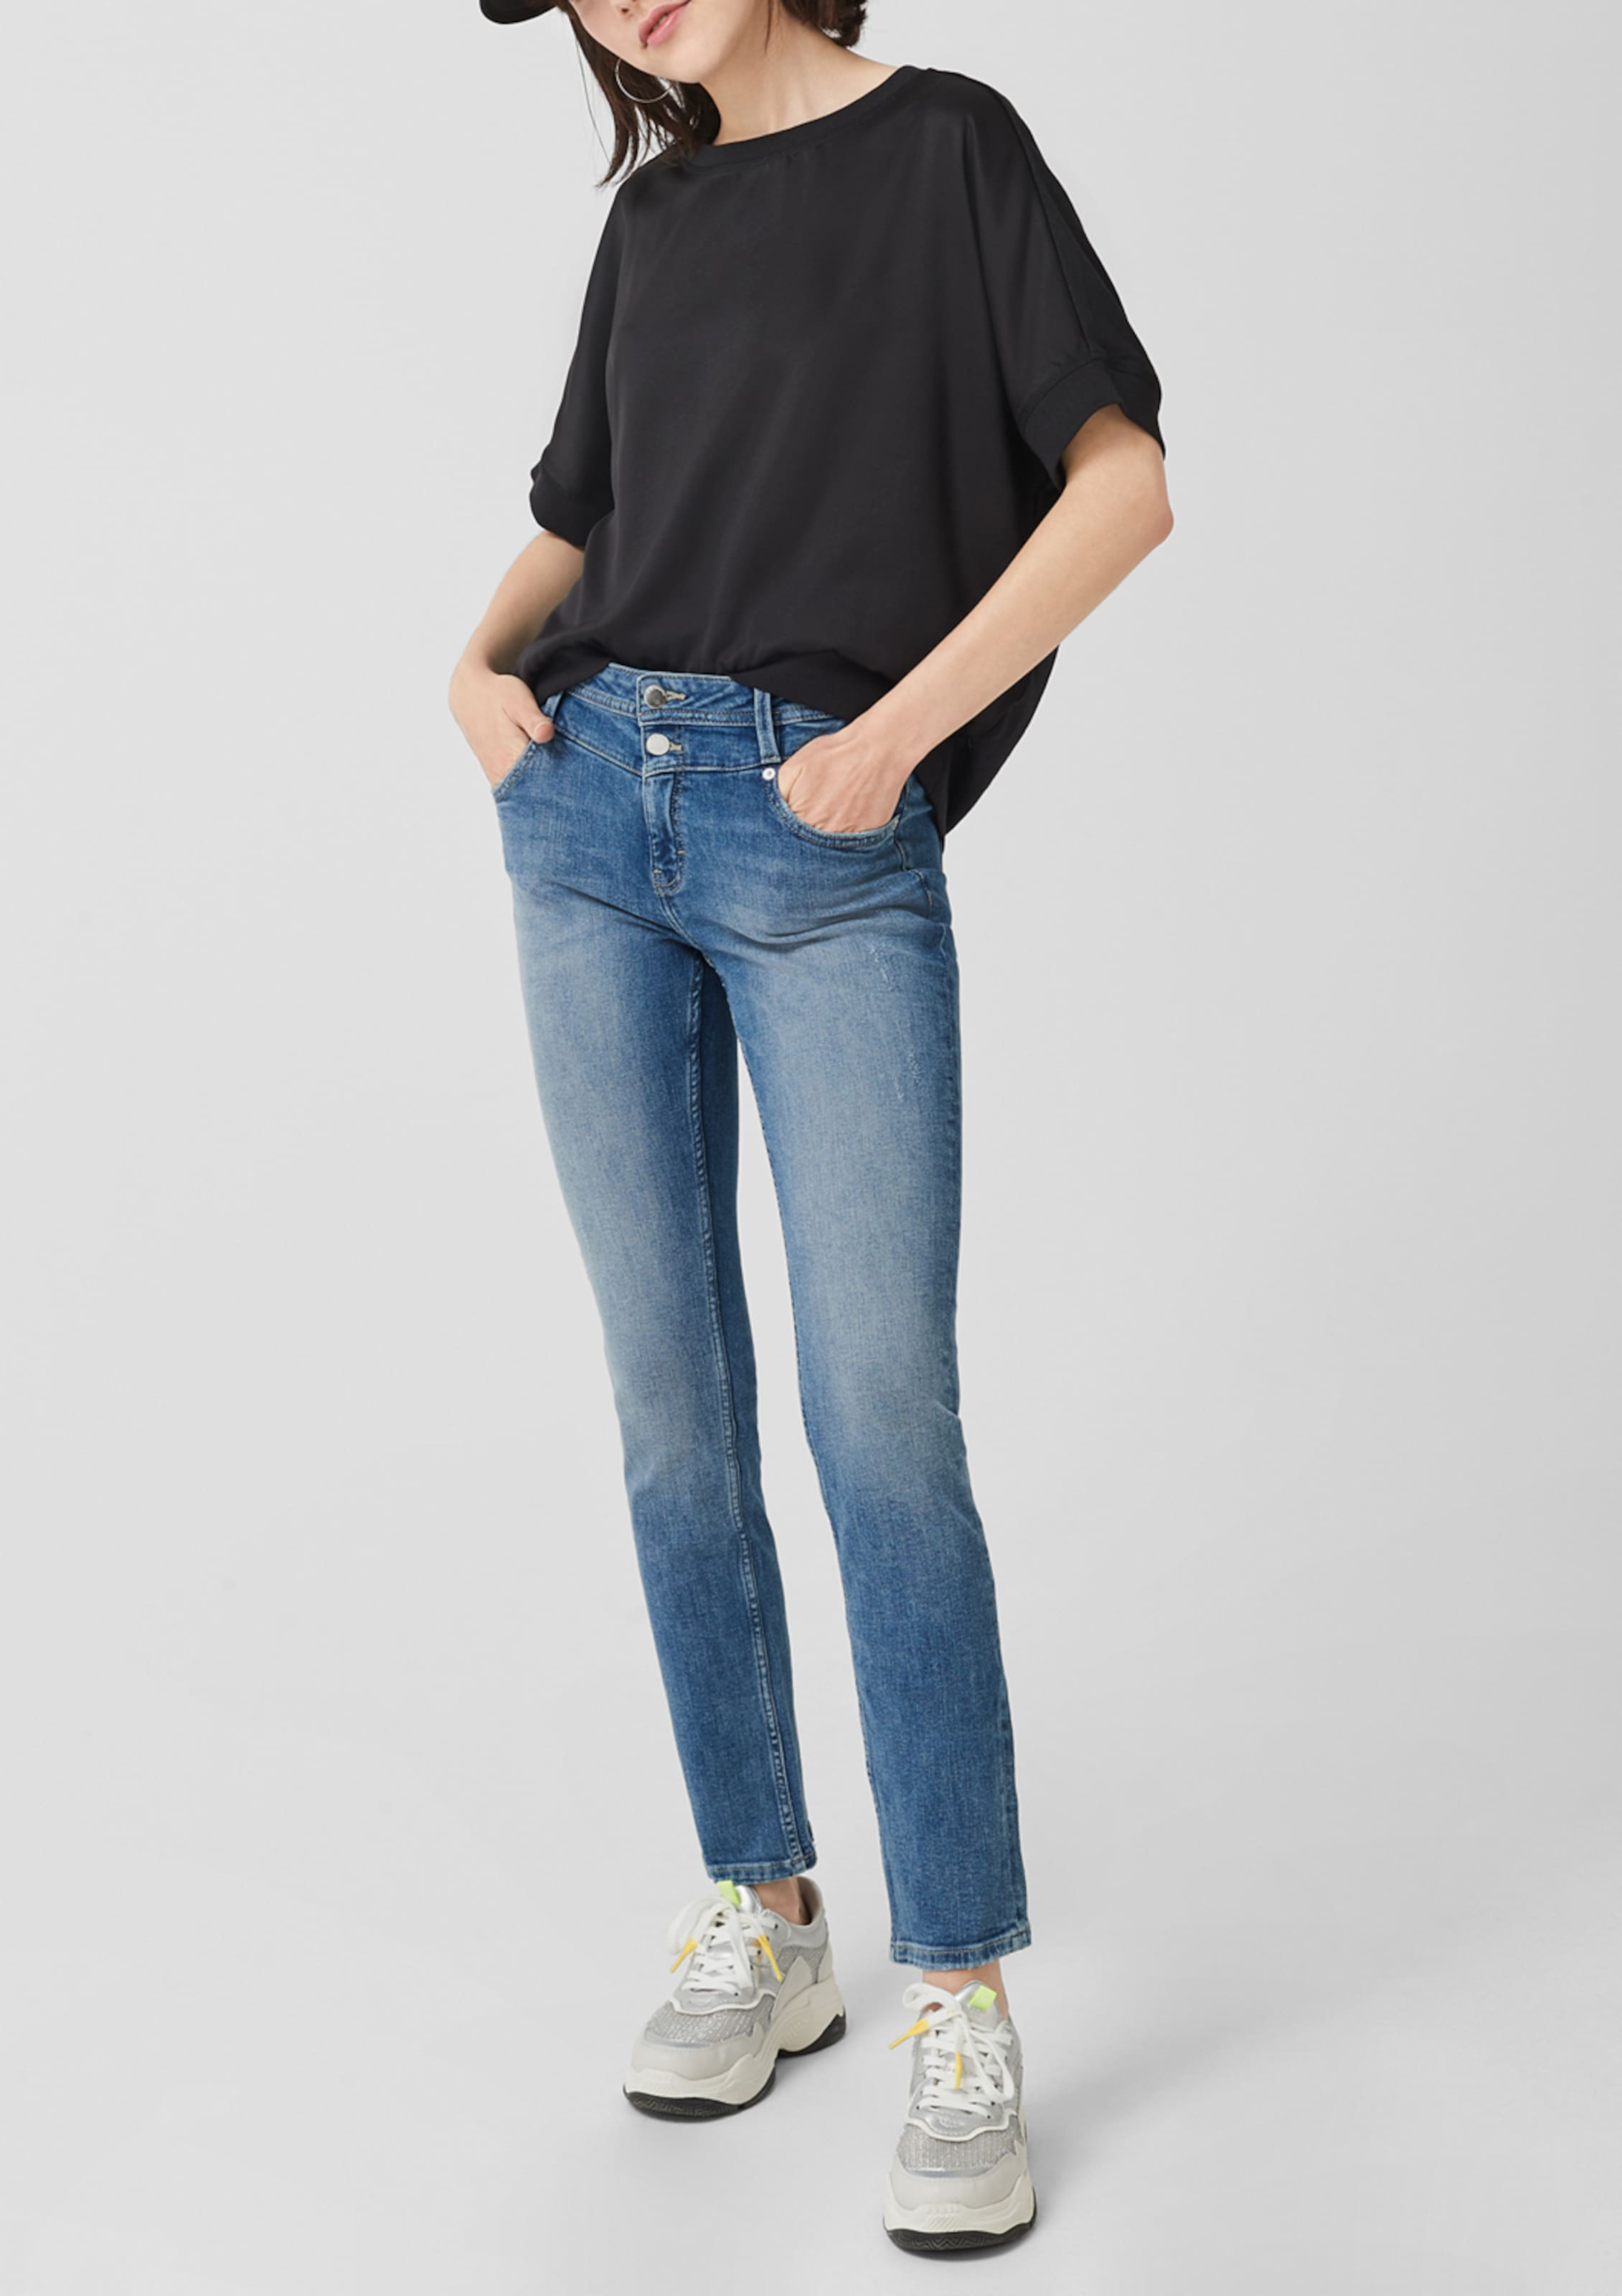 Jeans In Q By Blau Designed s HID9E2